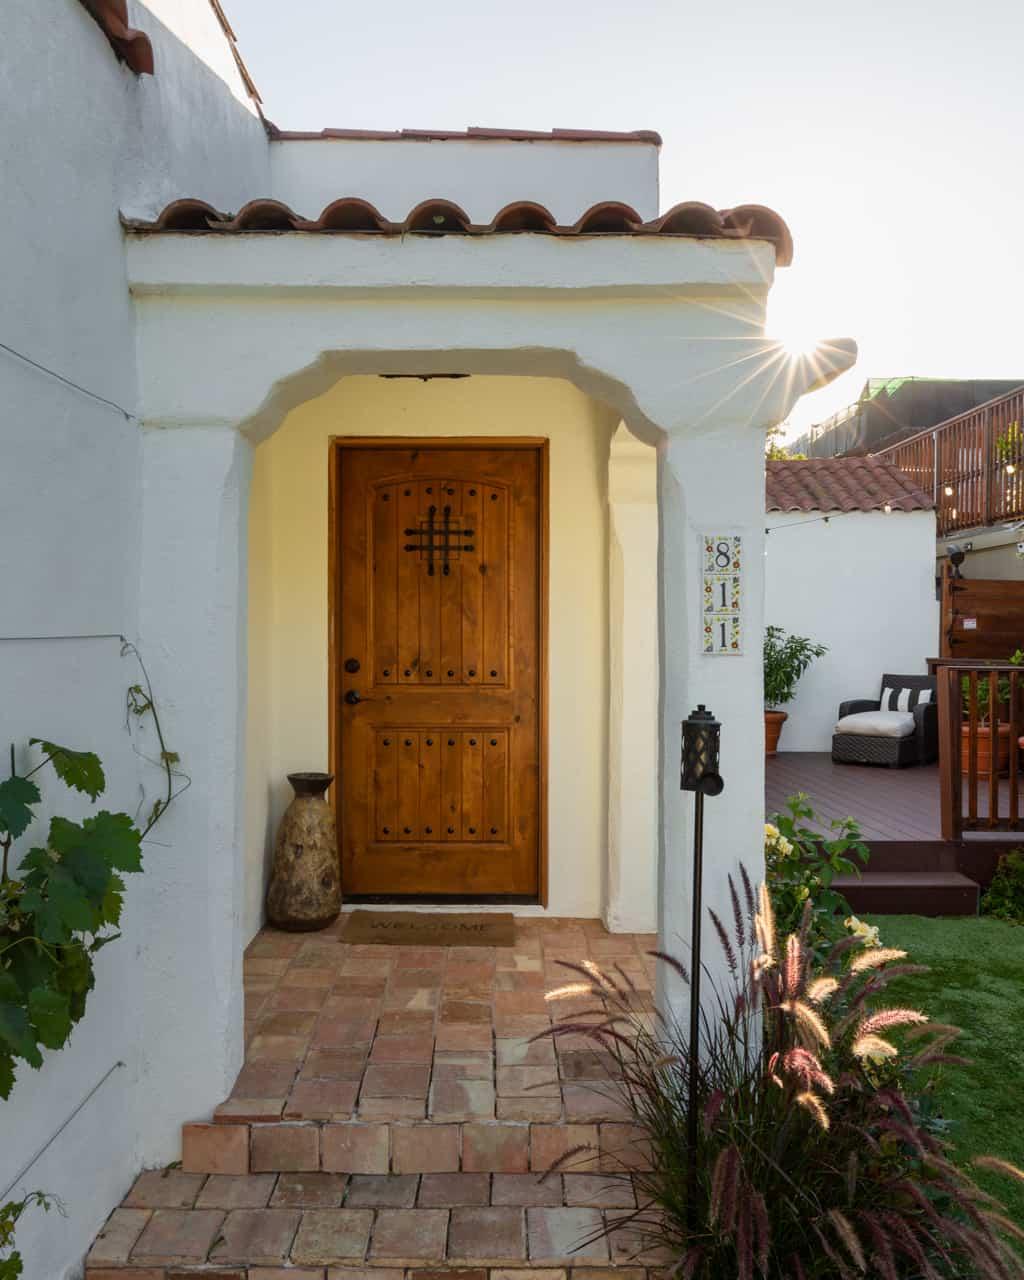 811 N Sweetzer Ave, Los Angeles CA 90069